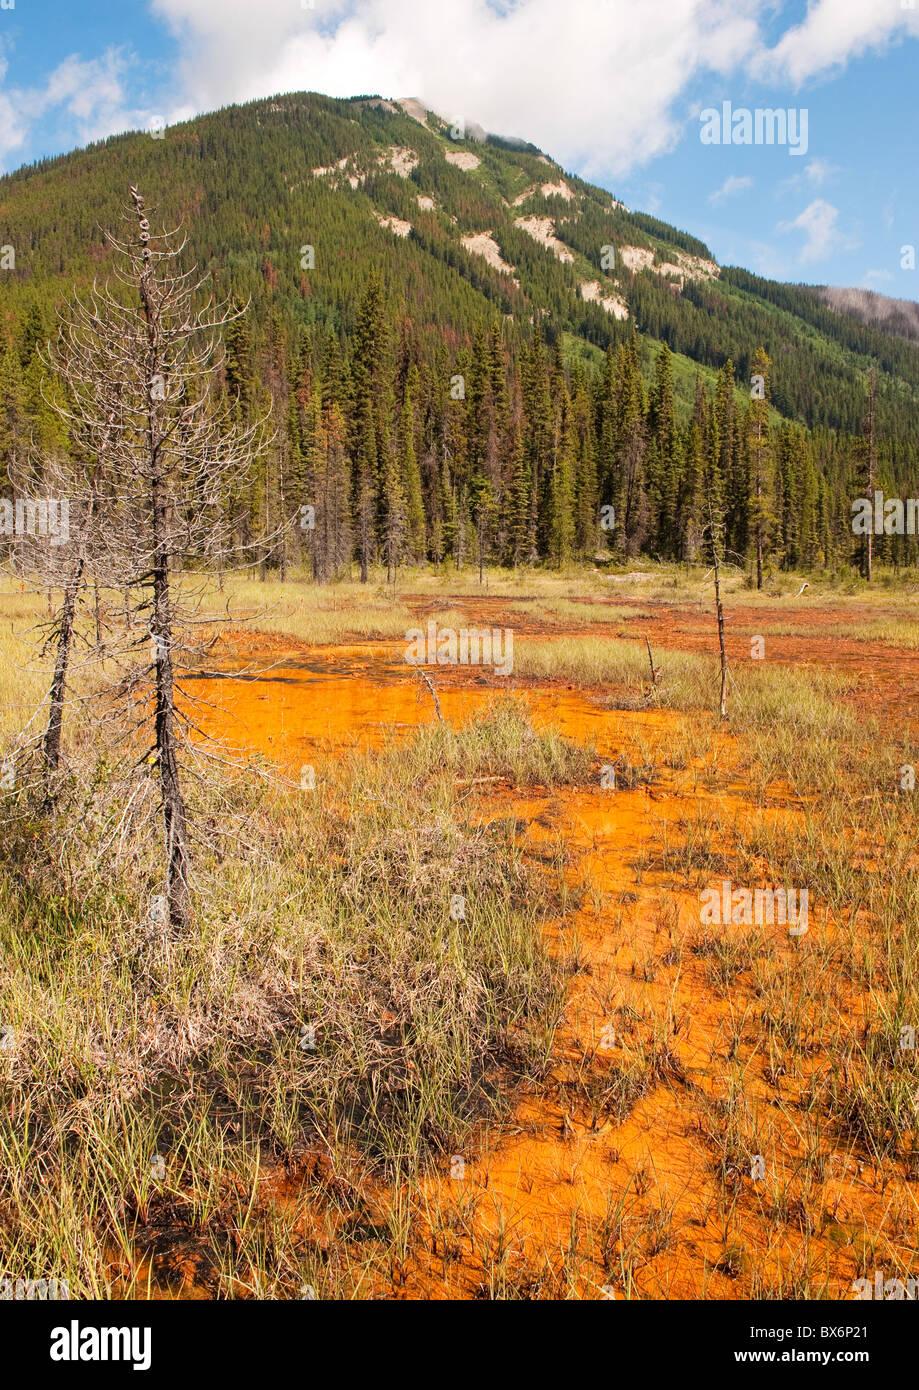 Ochre landscape at The Paint Pots, Kootenay National Park, British Columbia, Canada - Stock Image